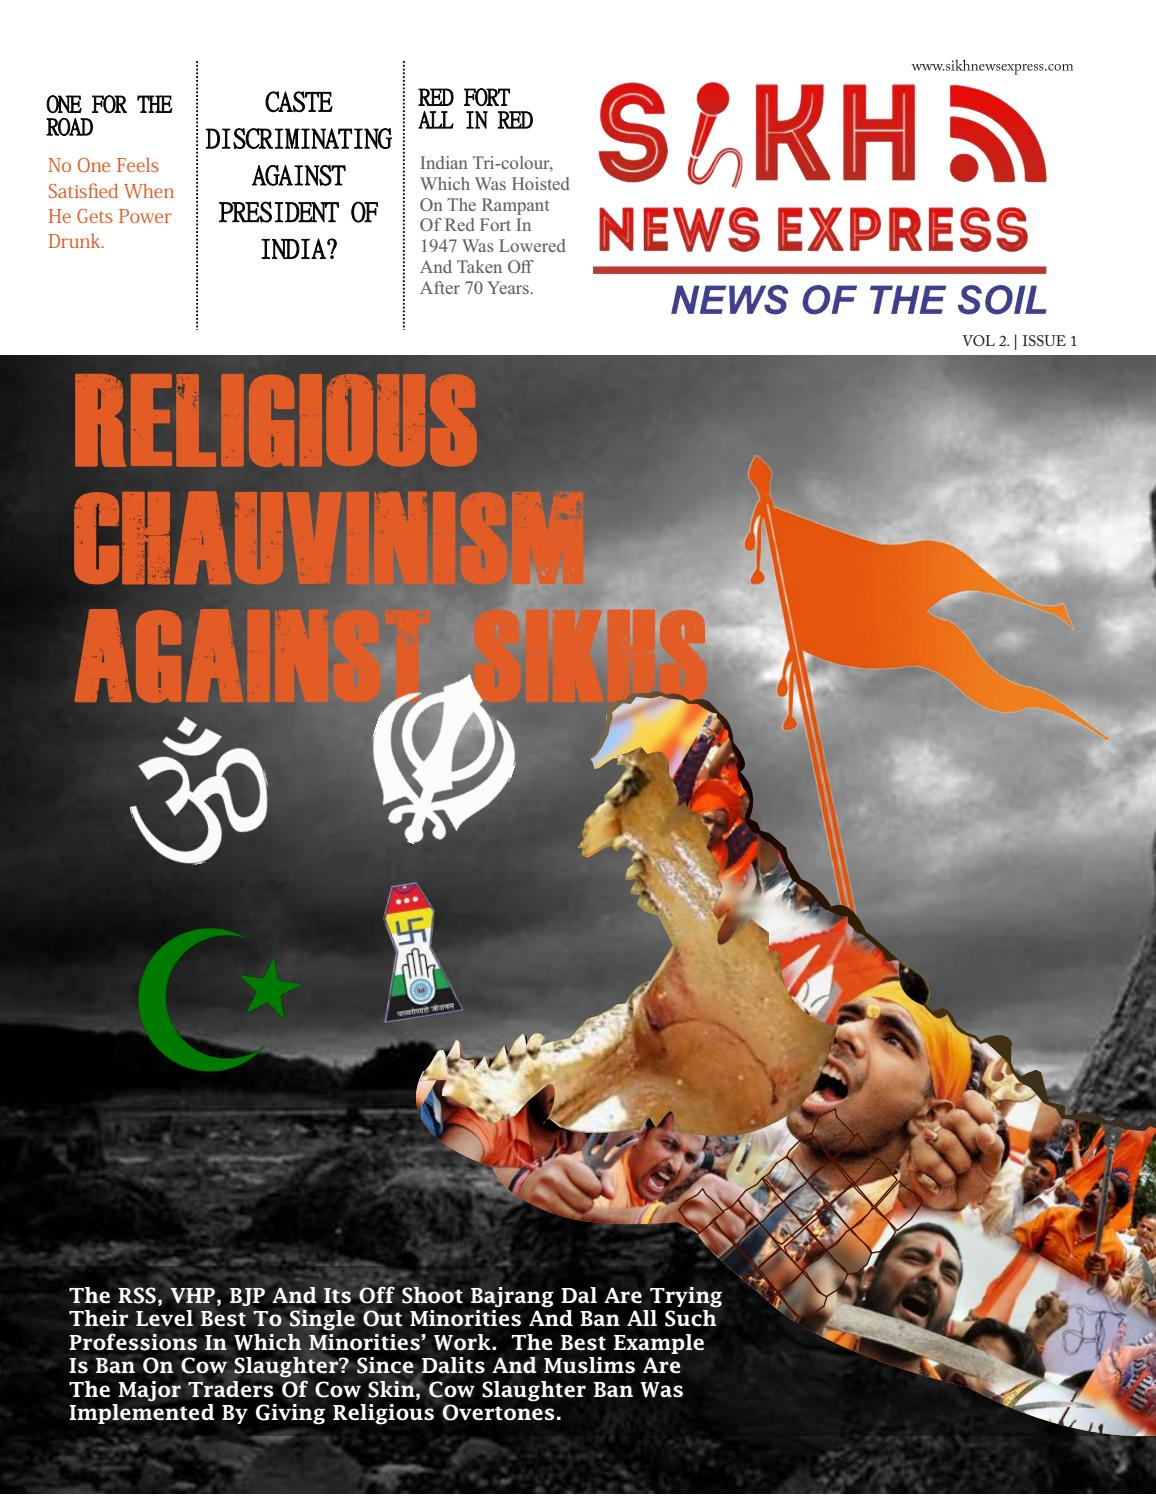 Diwali diya coloring page | Download Free Diwali diya coloring ... | 1496x1156